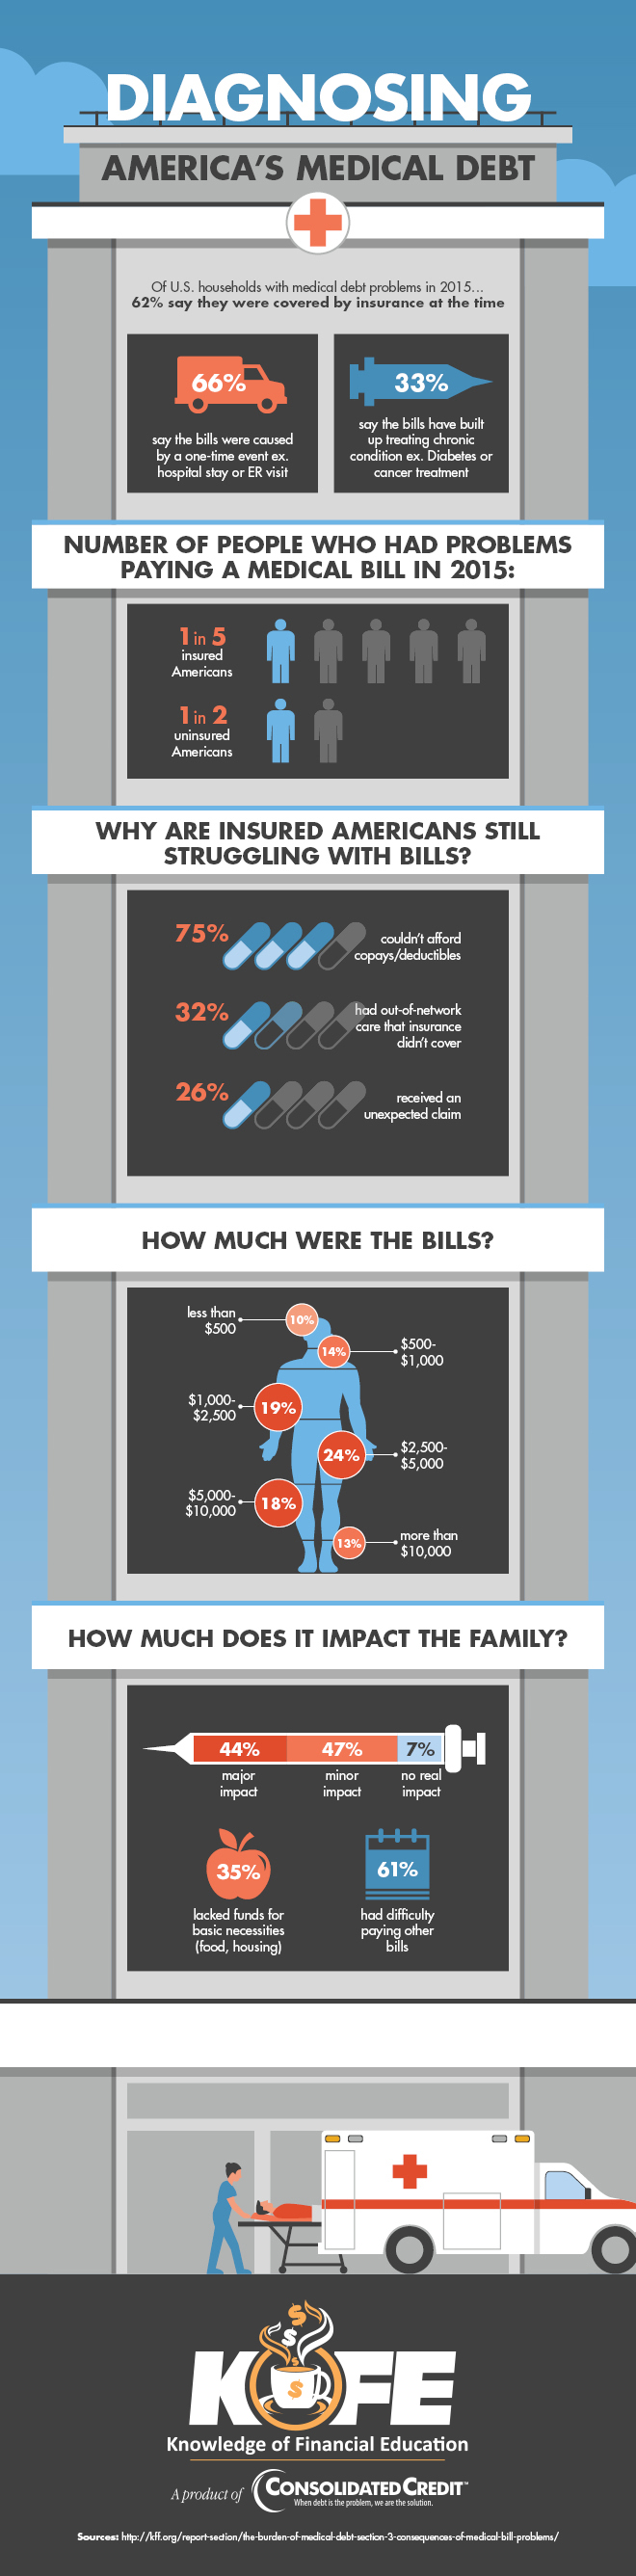 Diagnosing America's Medical Debt infographic